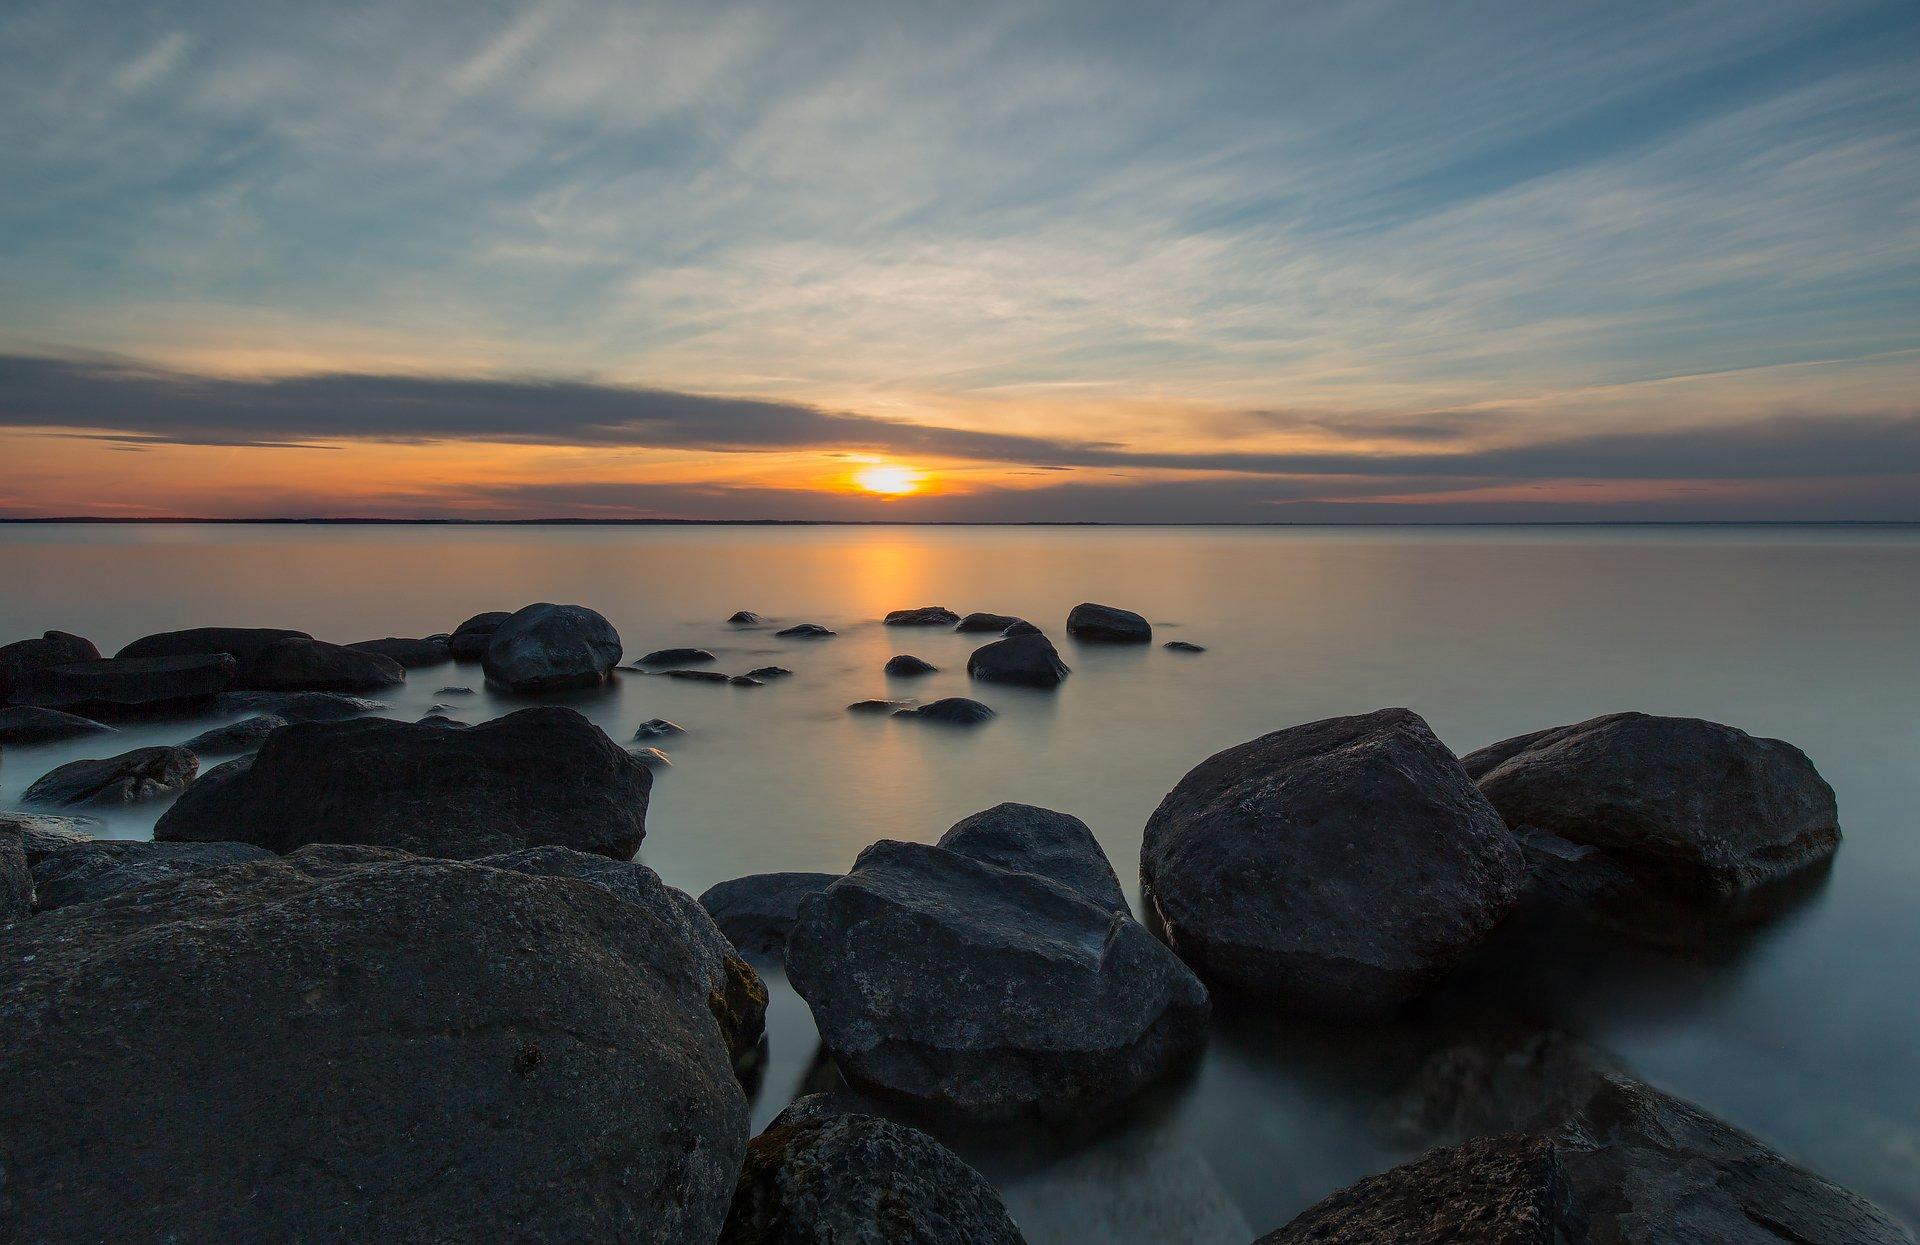 autumn, lake, sunset, rocks, осень, озеро, закат, камни, G A S